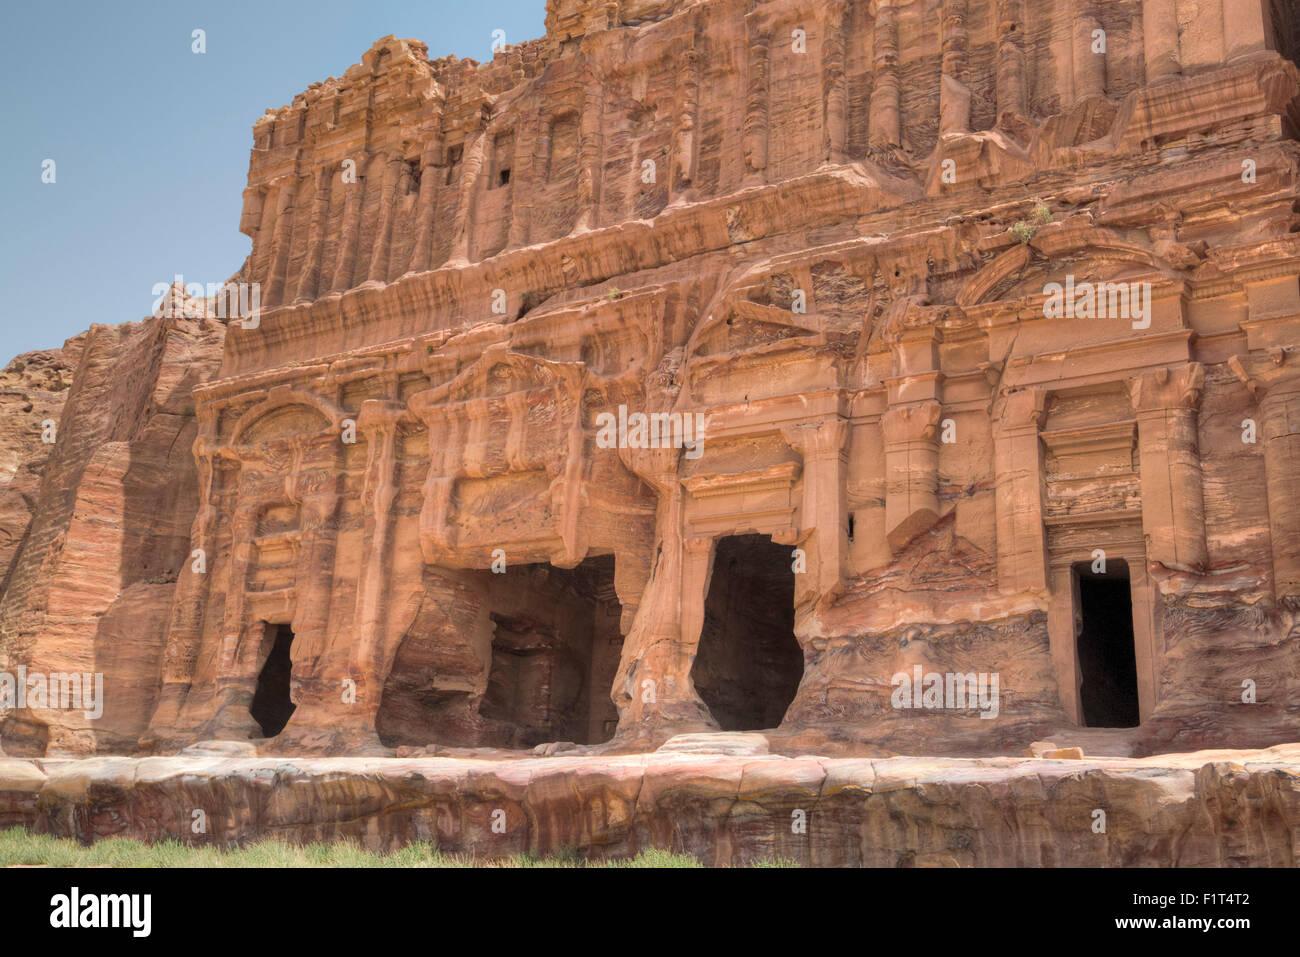 Palace Tomb, Royal Tombs, Petra, UNESCO World Heritage Site, Jordan, Middle East Stock Photo